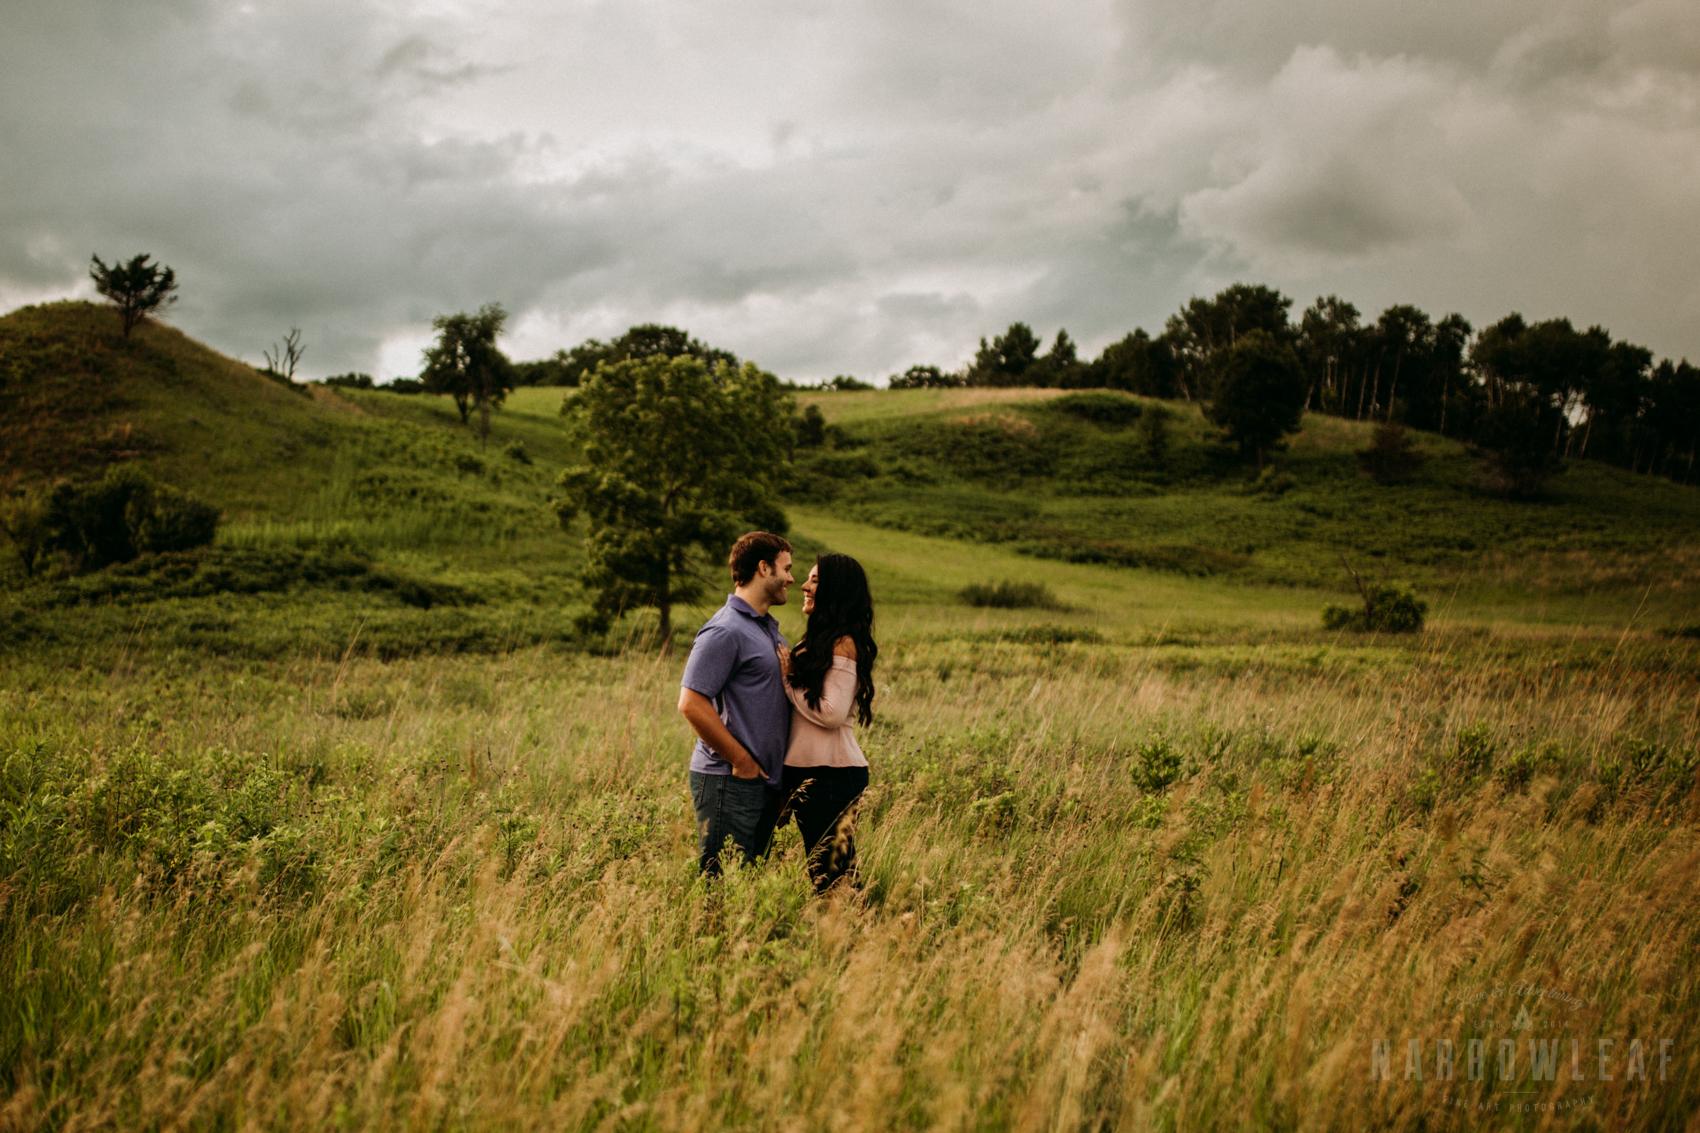 summer-engagement-photos-frontenac-mn-NarrowLeaf_Love_&_Adventure_Photography-8.jpg